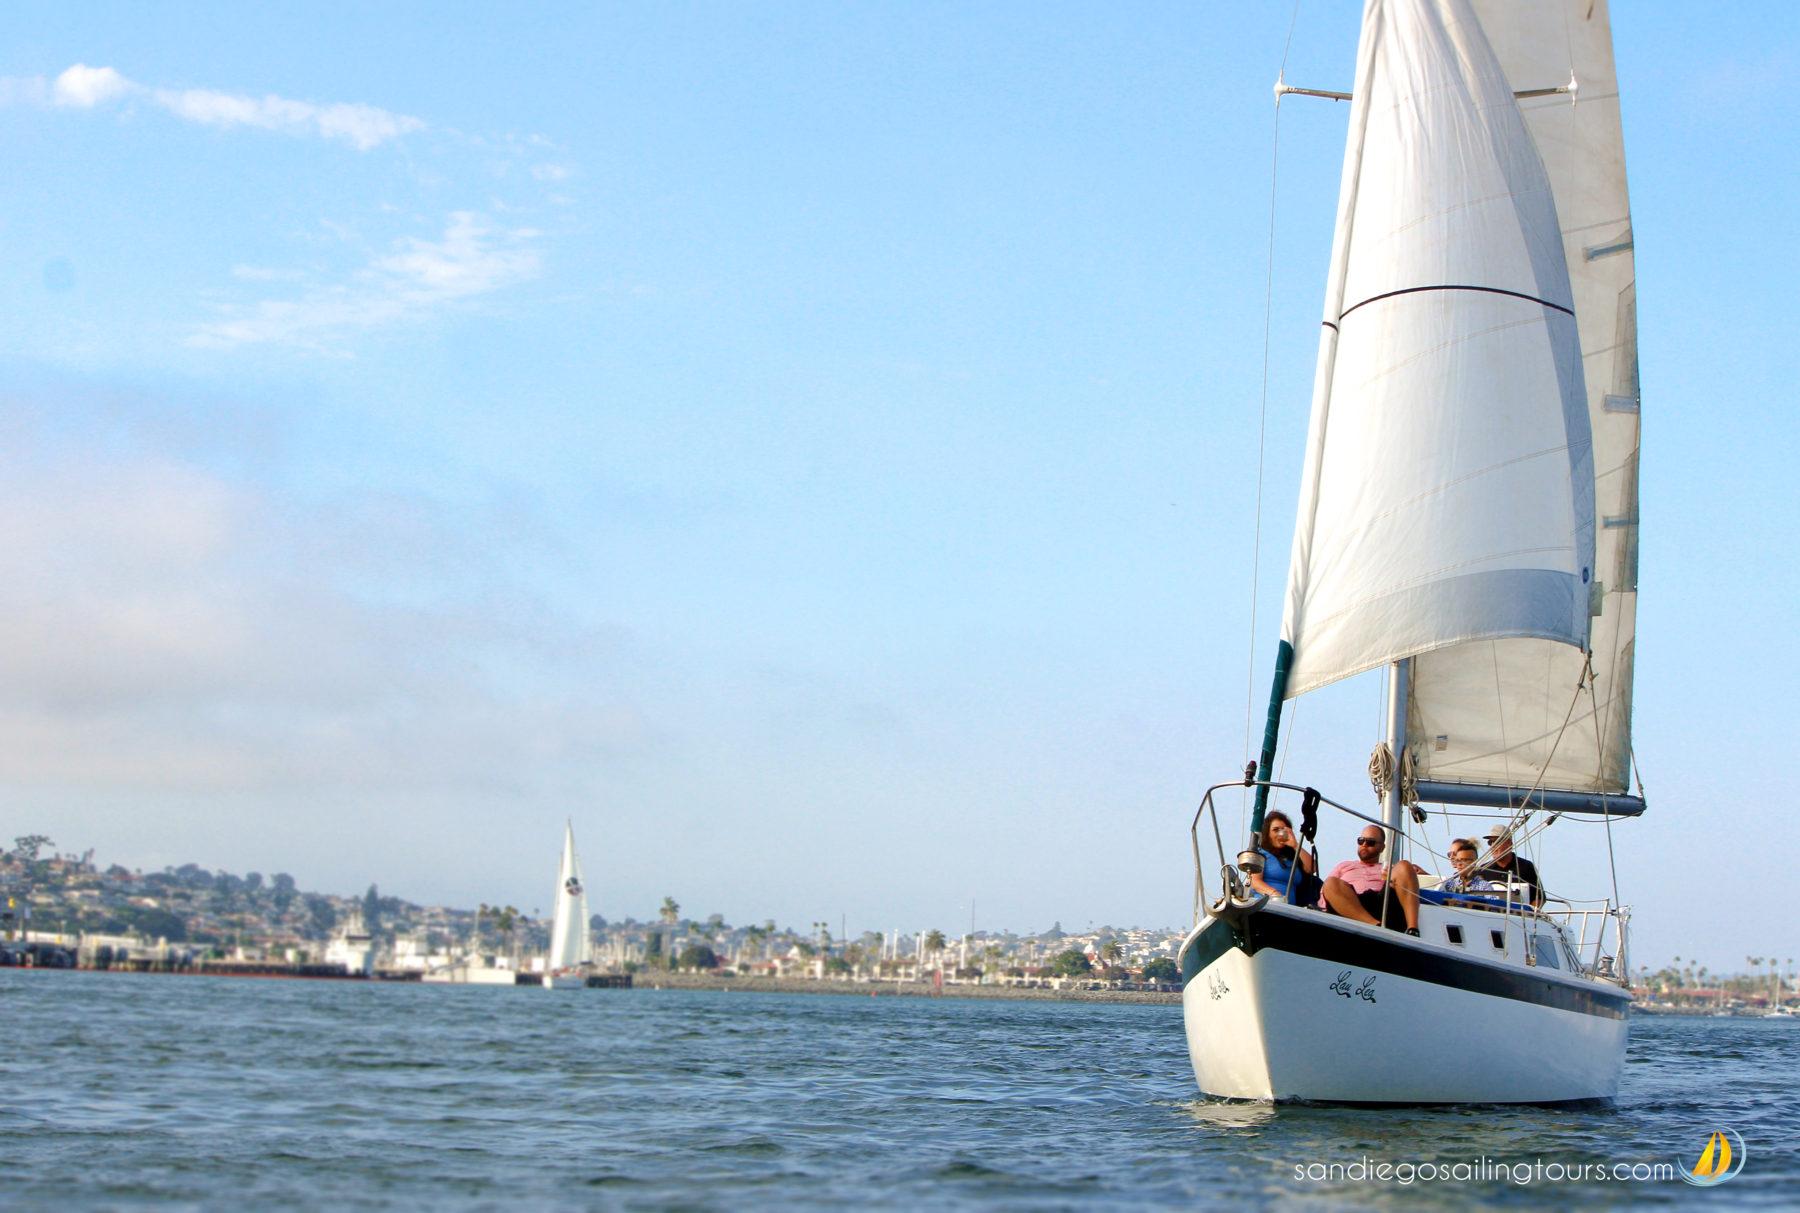 Featured Image: Lau Lea Afloat on the Bay